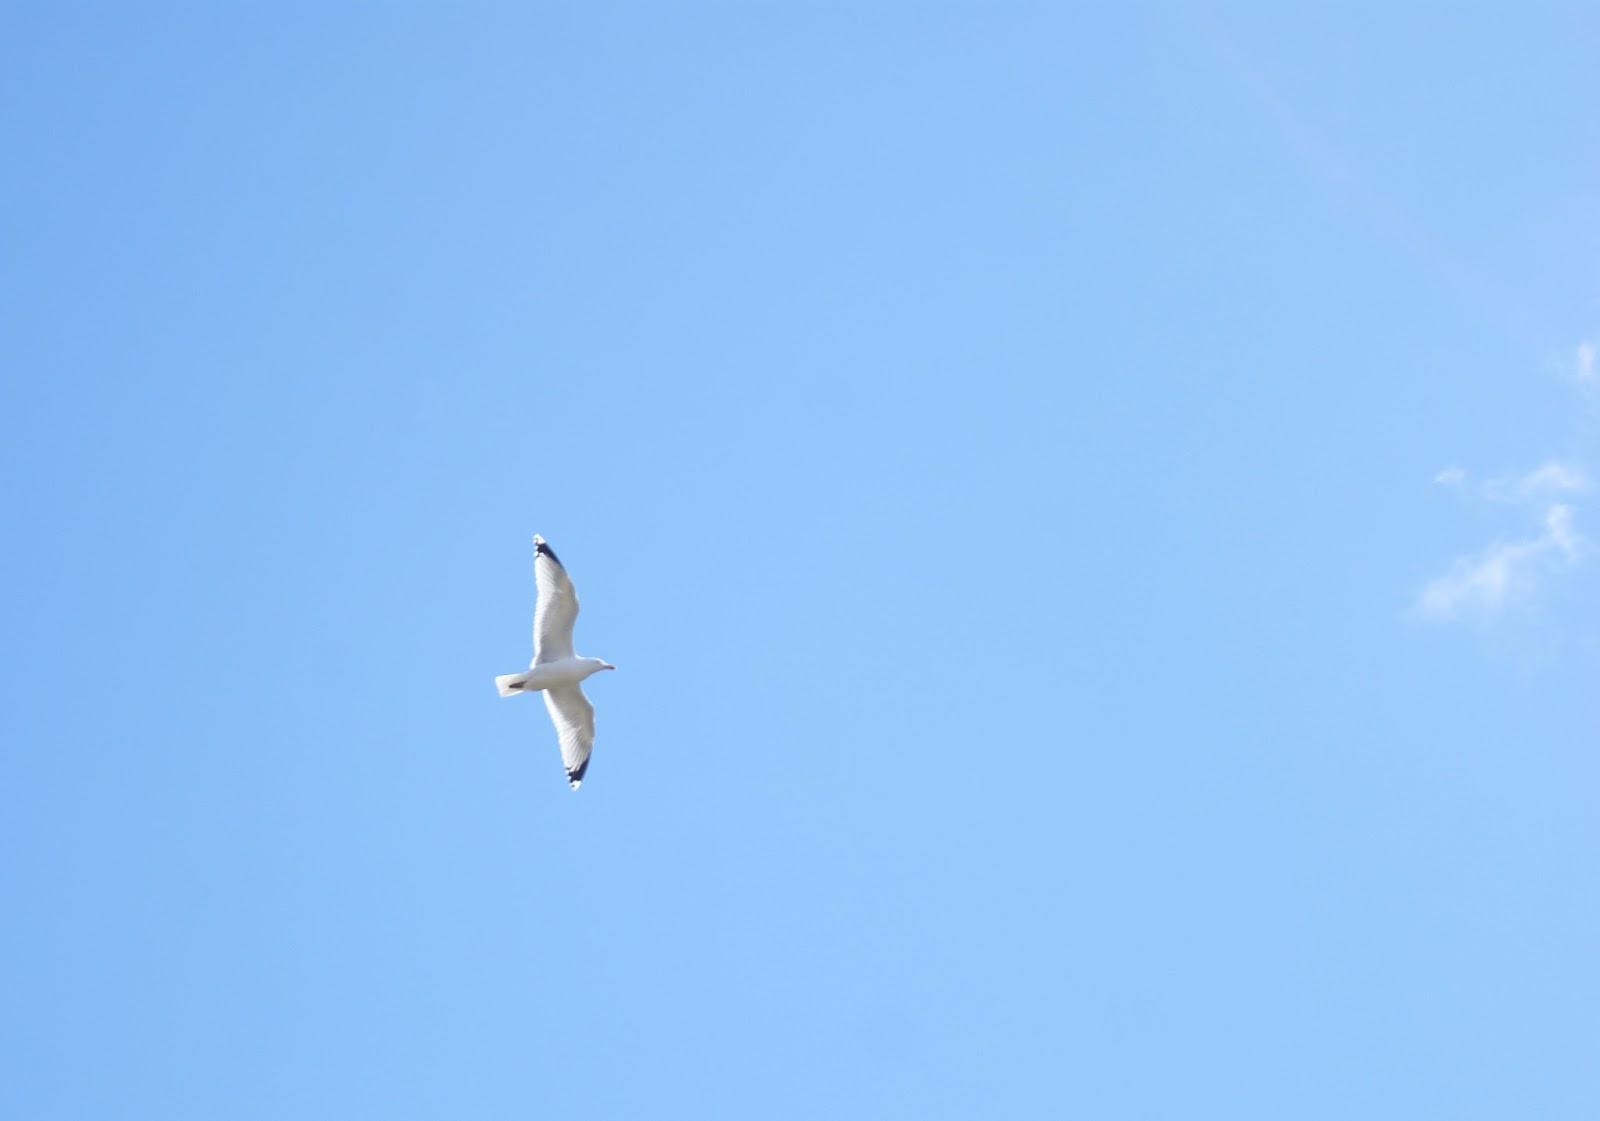 seagull bird loch linnhe highlands scotland united kingdom uk